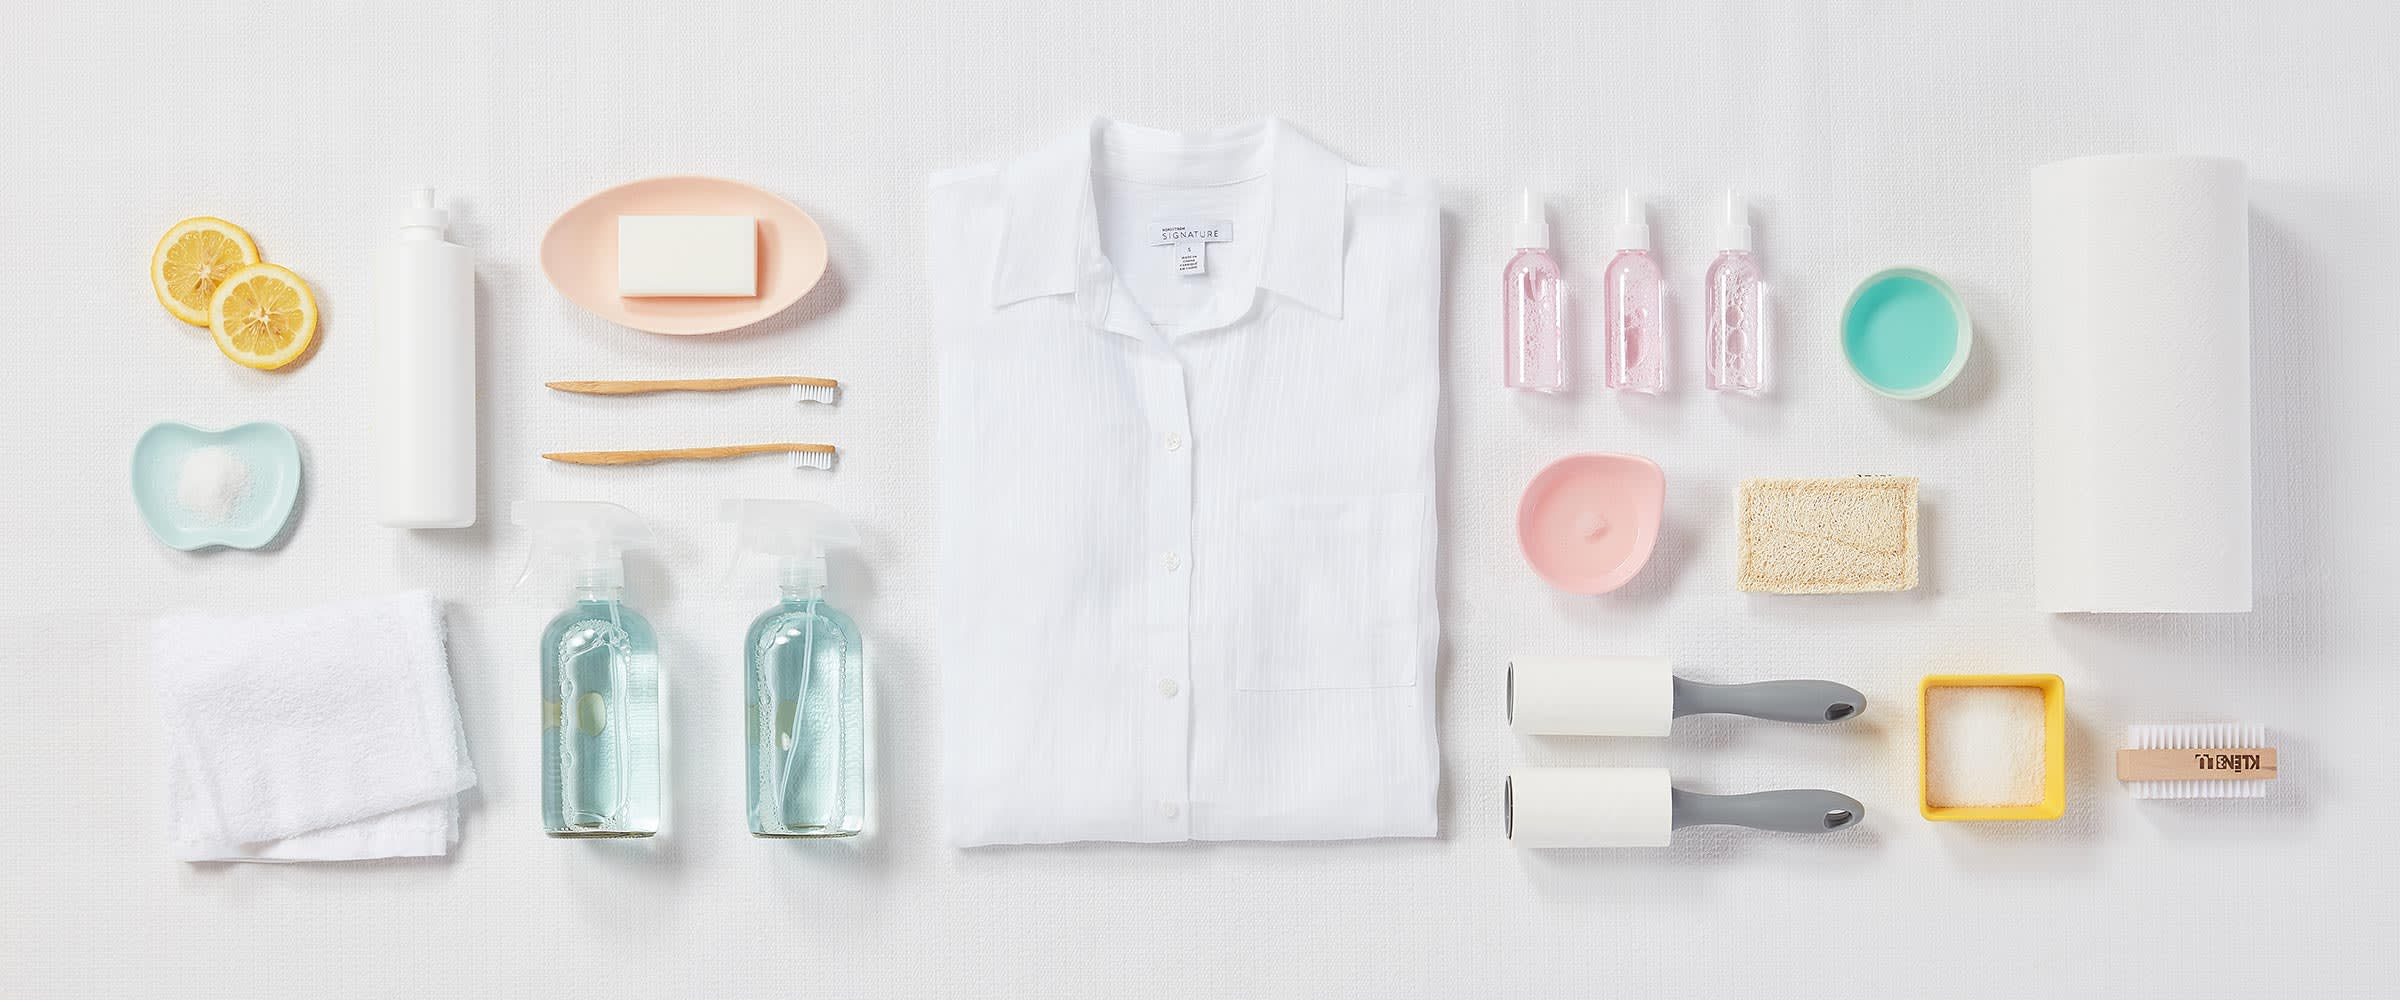 White clothing care kit